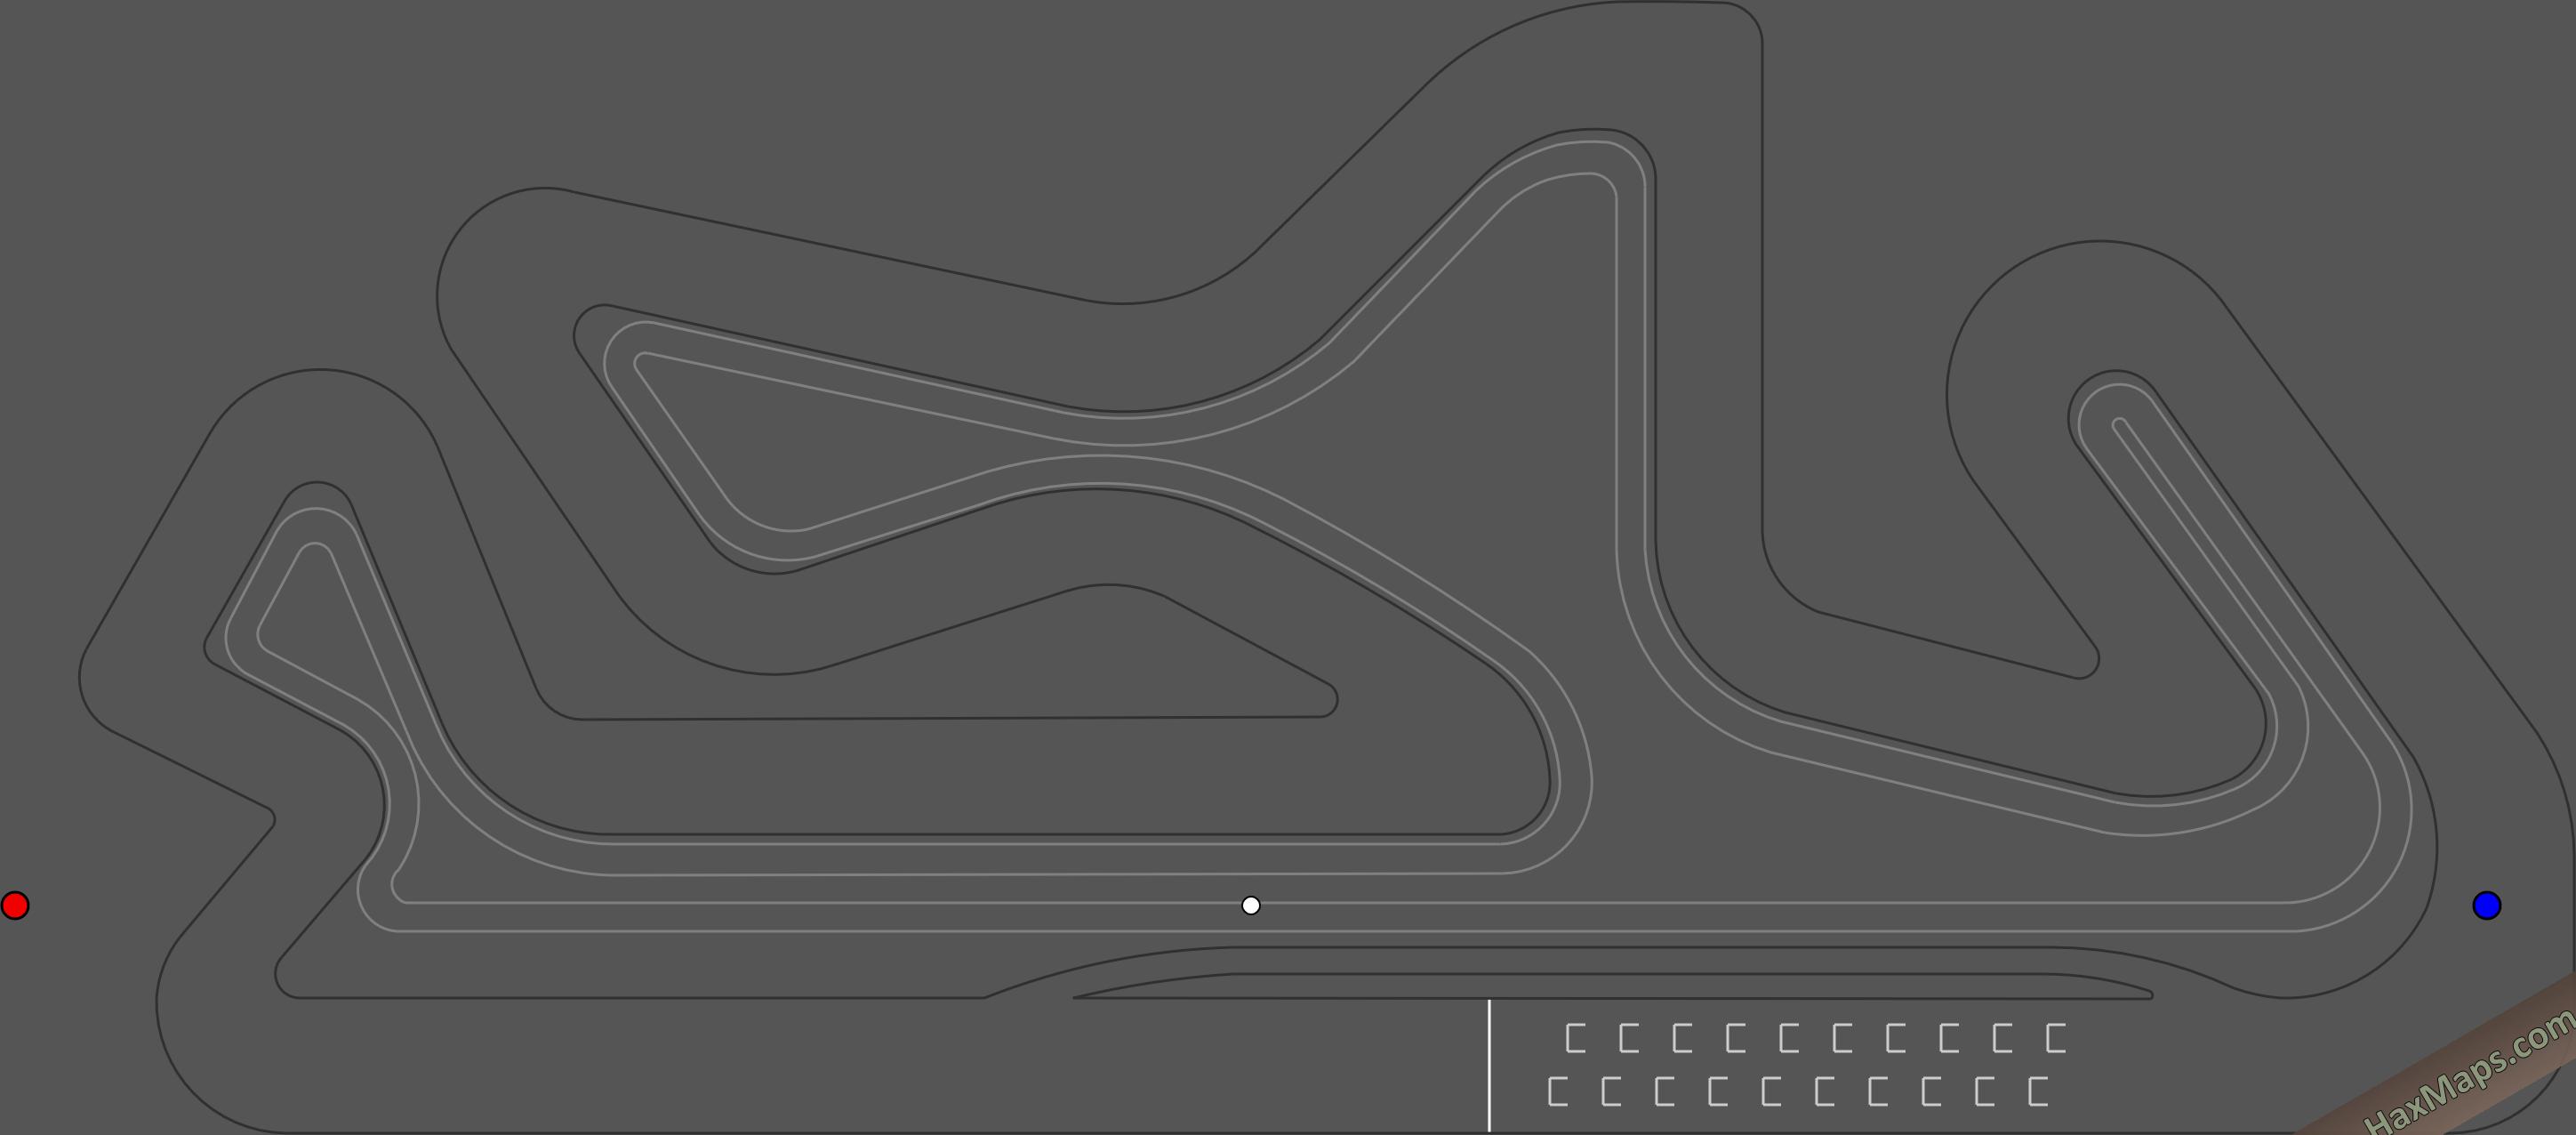 hax ball maps | F1 Autodromo Internacional de Algavre by POPkORN